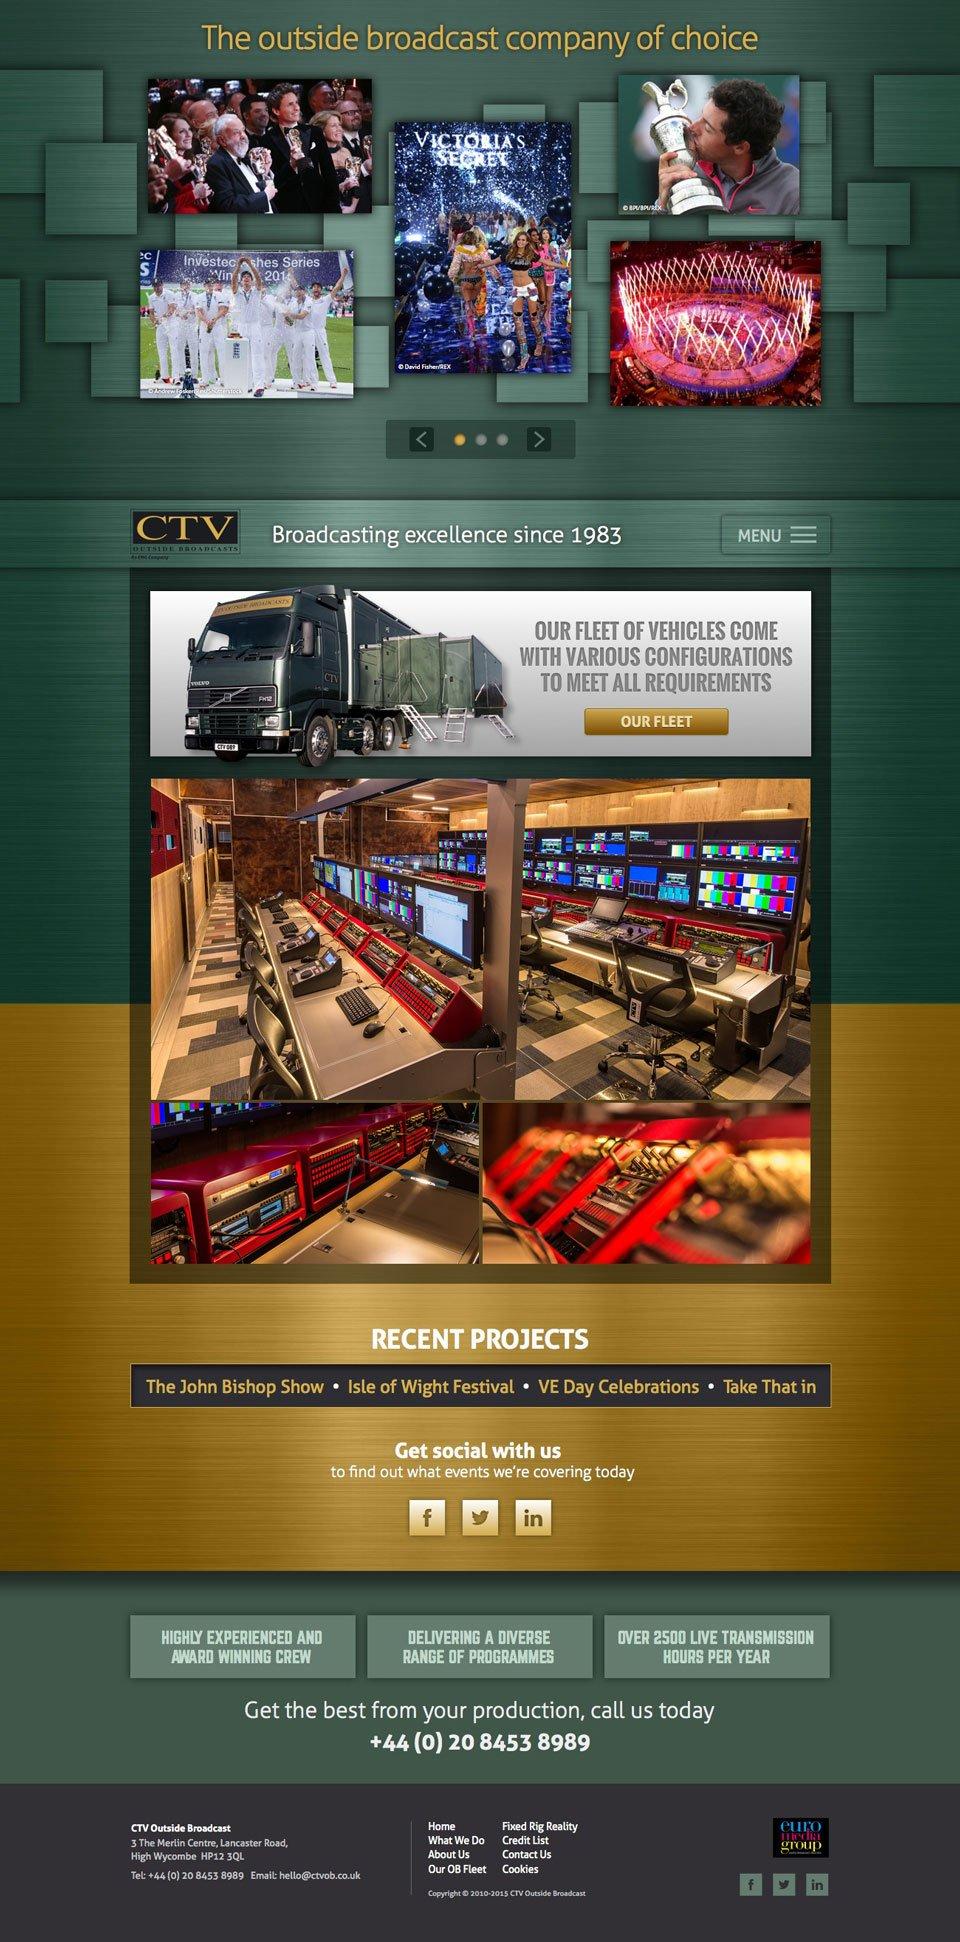 ctv-website-home-page